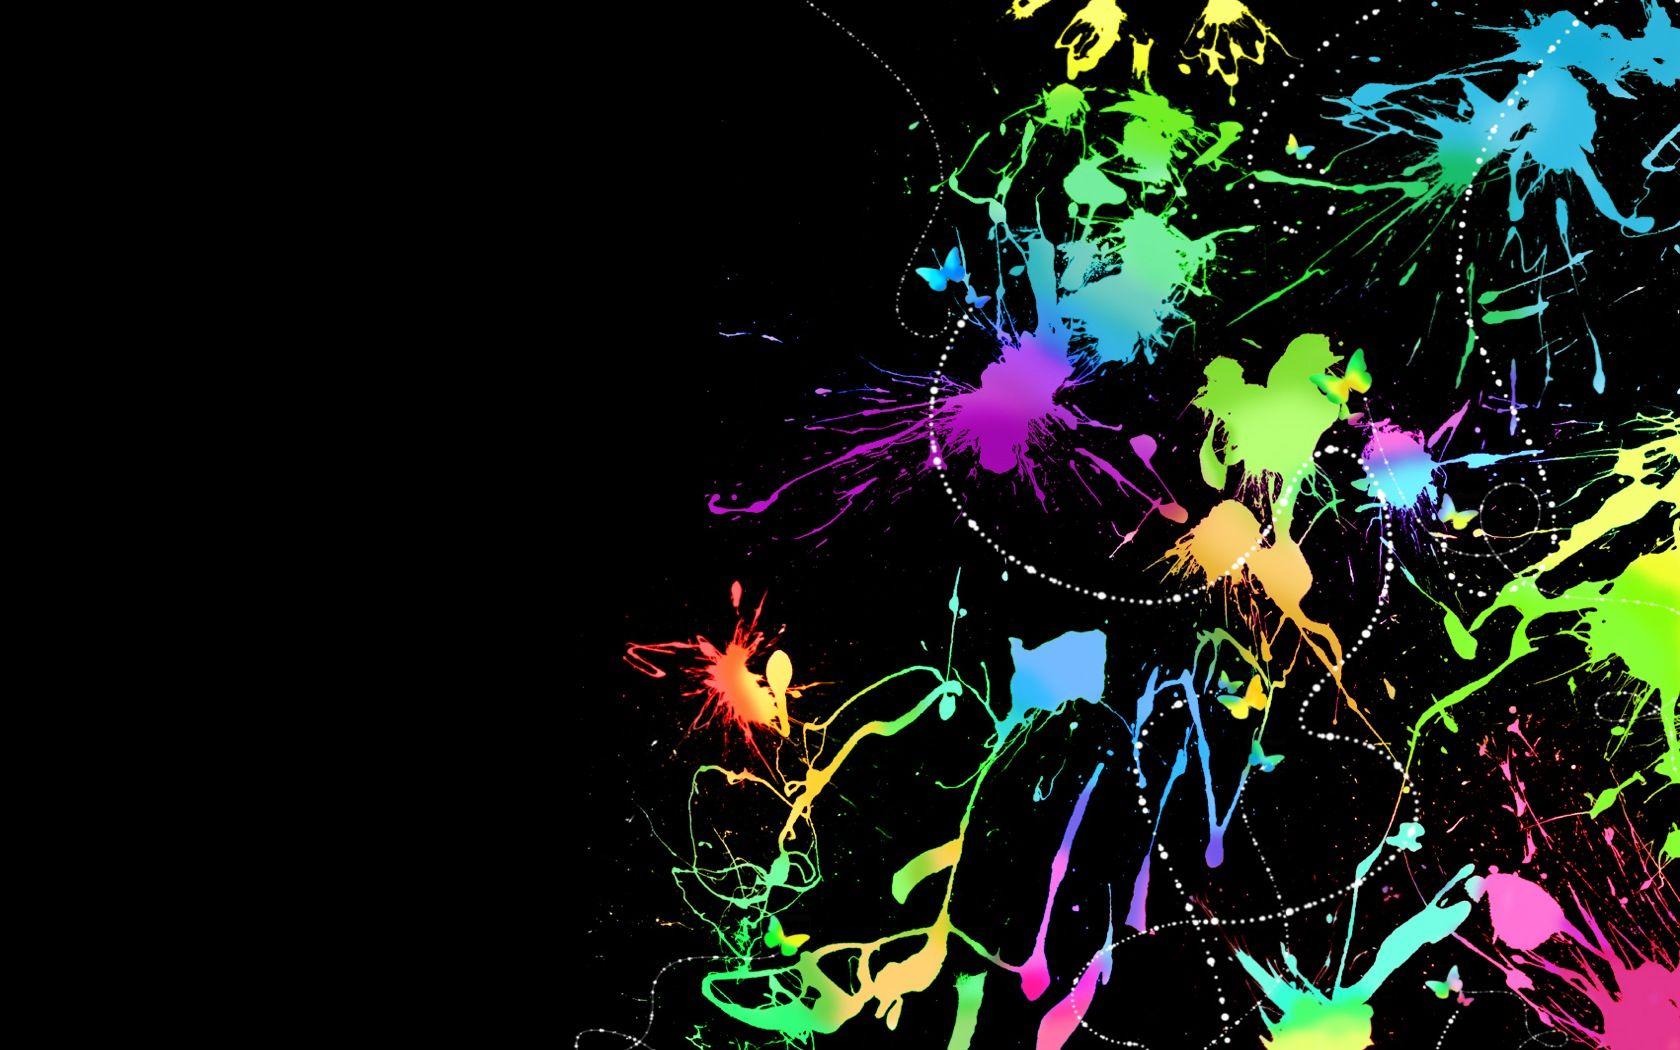 Abstract Digital Paint Art Abstract Art Wallpaper Colorful Wallpaper Abstract